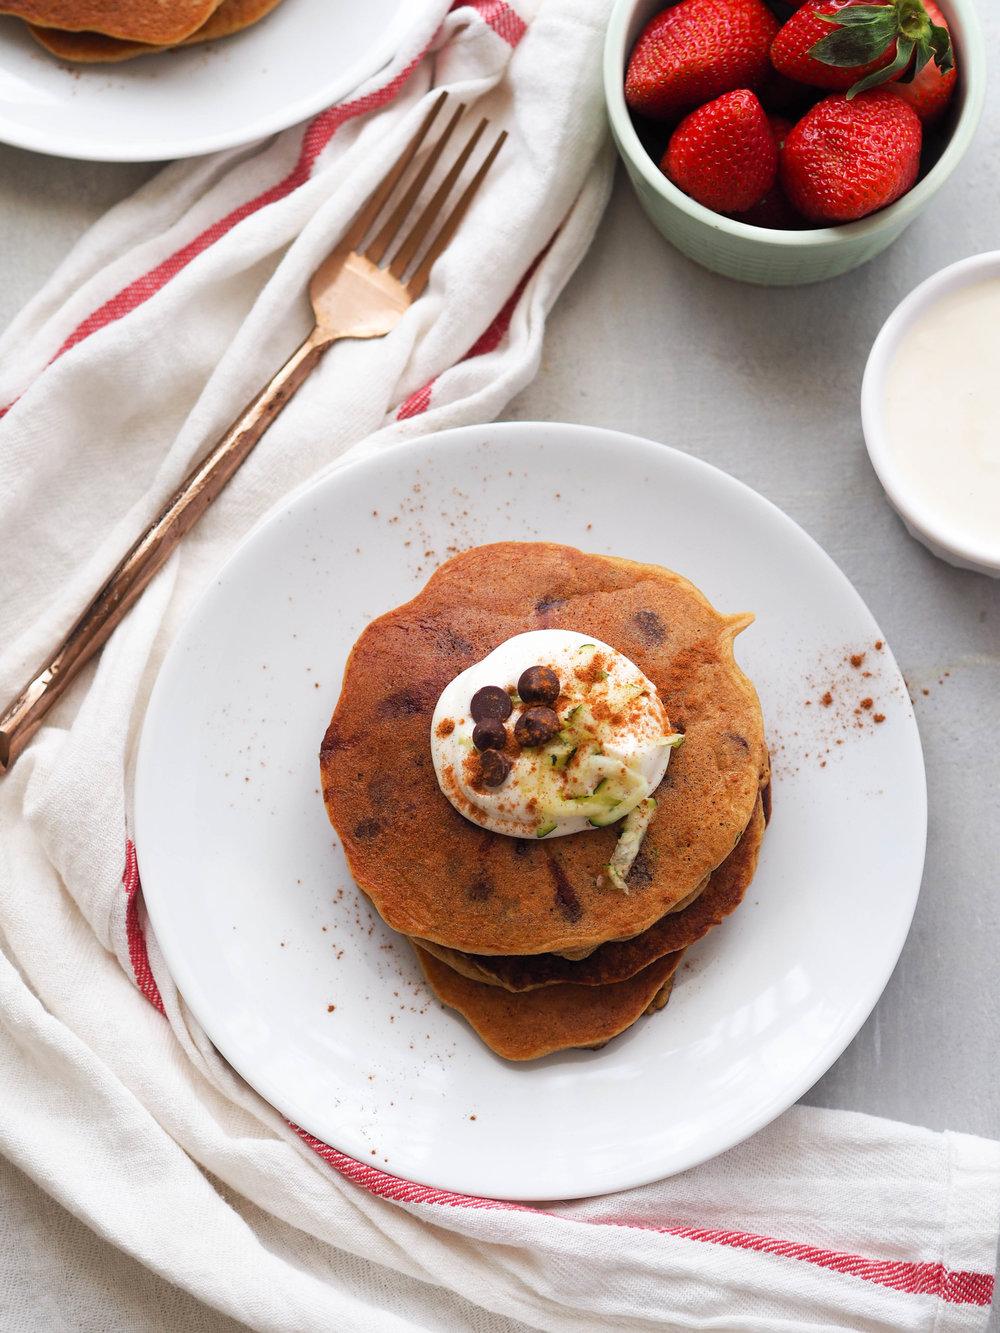 Zucchini bread in pancake form, plus dark chocolate chips! Make these almond flour zucchini bread chocolate chip pancakes, topped with a maple Greek yogurt topping! #breakfast #pancake #chocolate #glutenfree #grainfree #brunch #healthyrecipe